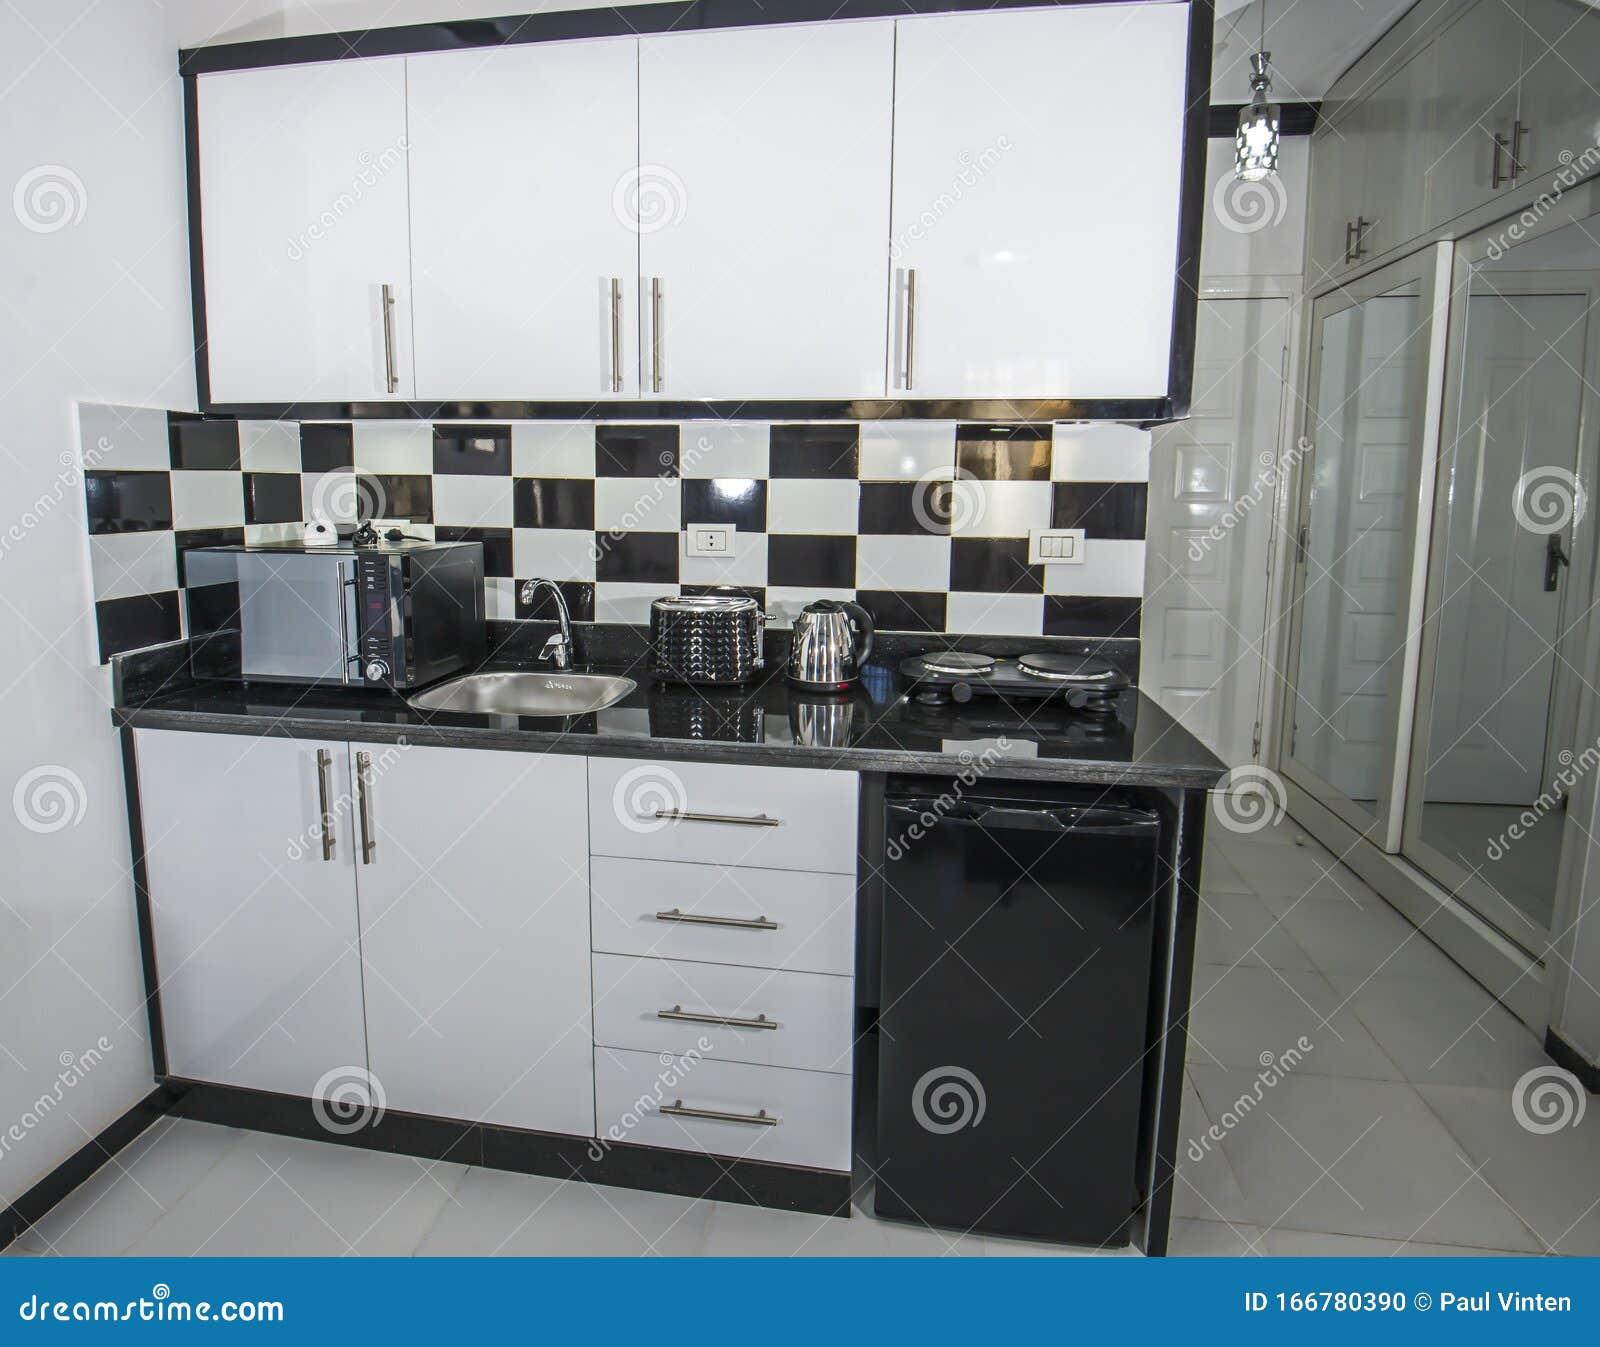 Modern Kitchen In A Luxury Apartment Stock Photo Image Of Handle Fridge 166780390